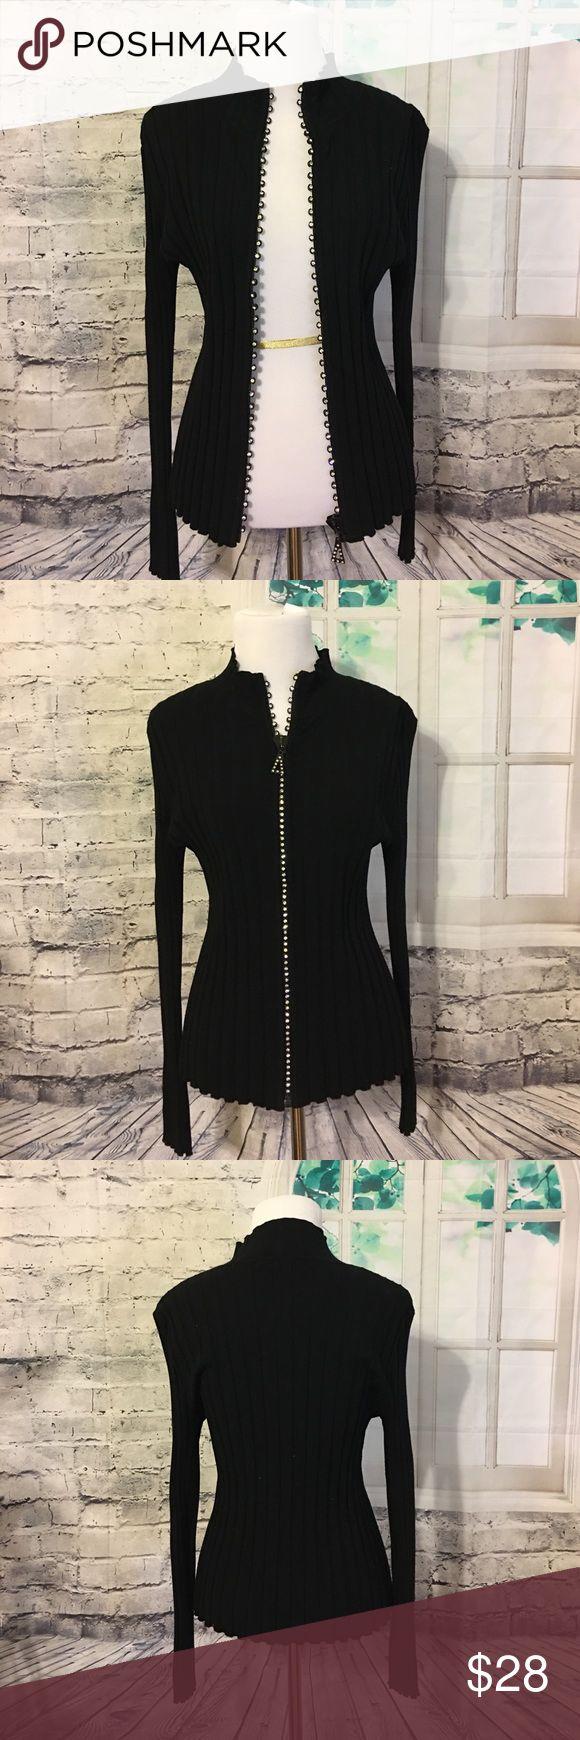 Beautiful black zip up sweater with crystals Beautiful black zip up sweater with crystals. New, never worn. Size: medium. Brand: Belldini Belldini Sweaters